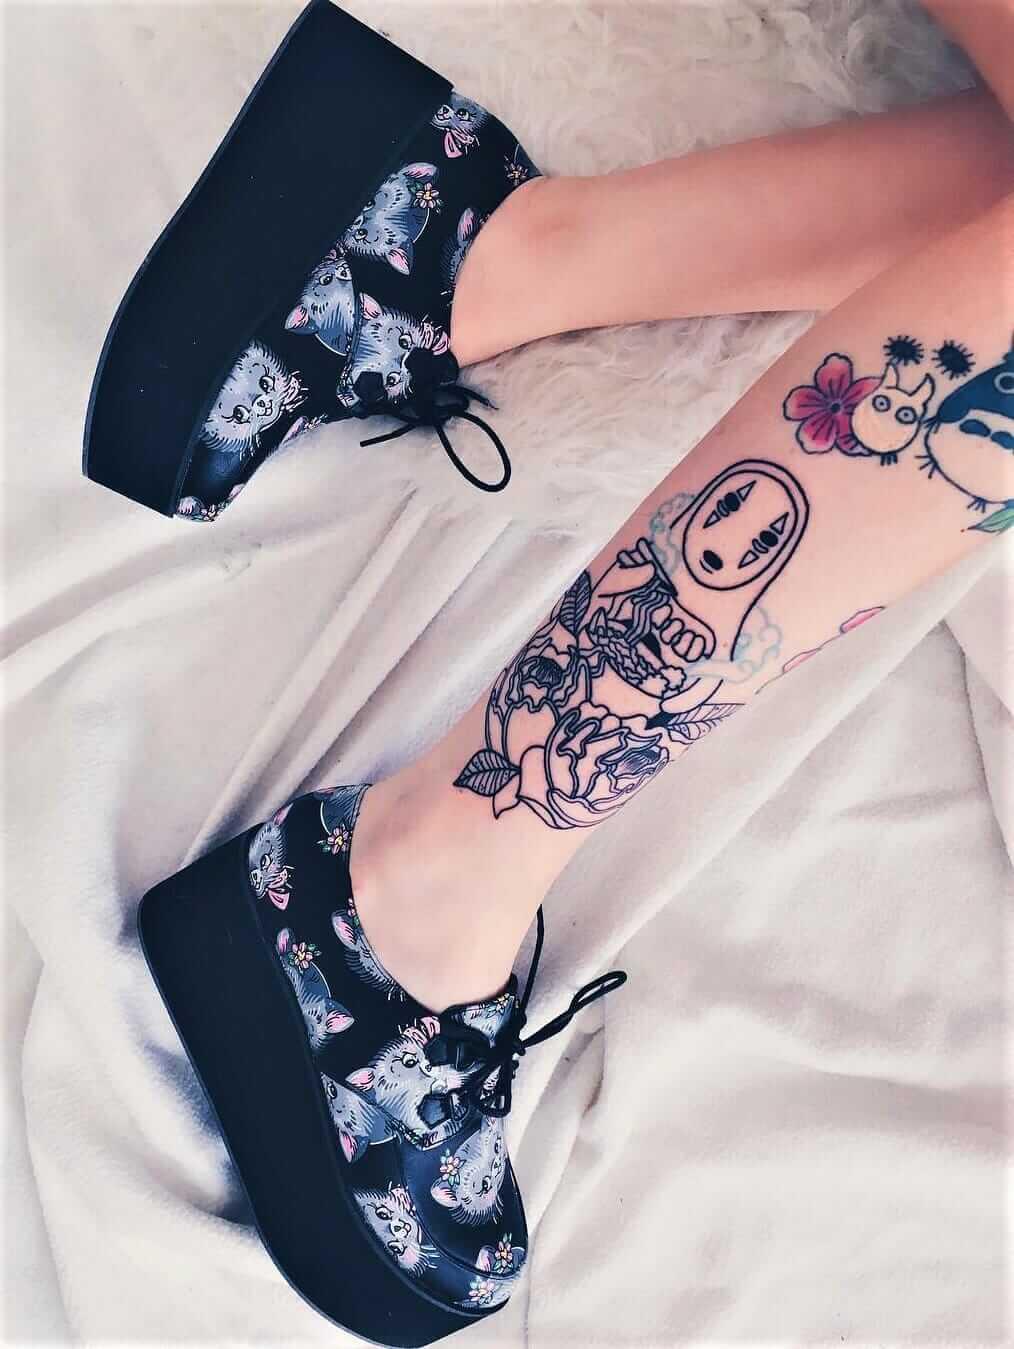 Studio Ghibli leg tattoos from nekomatahime